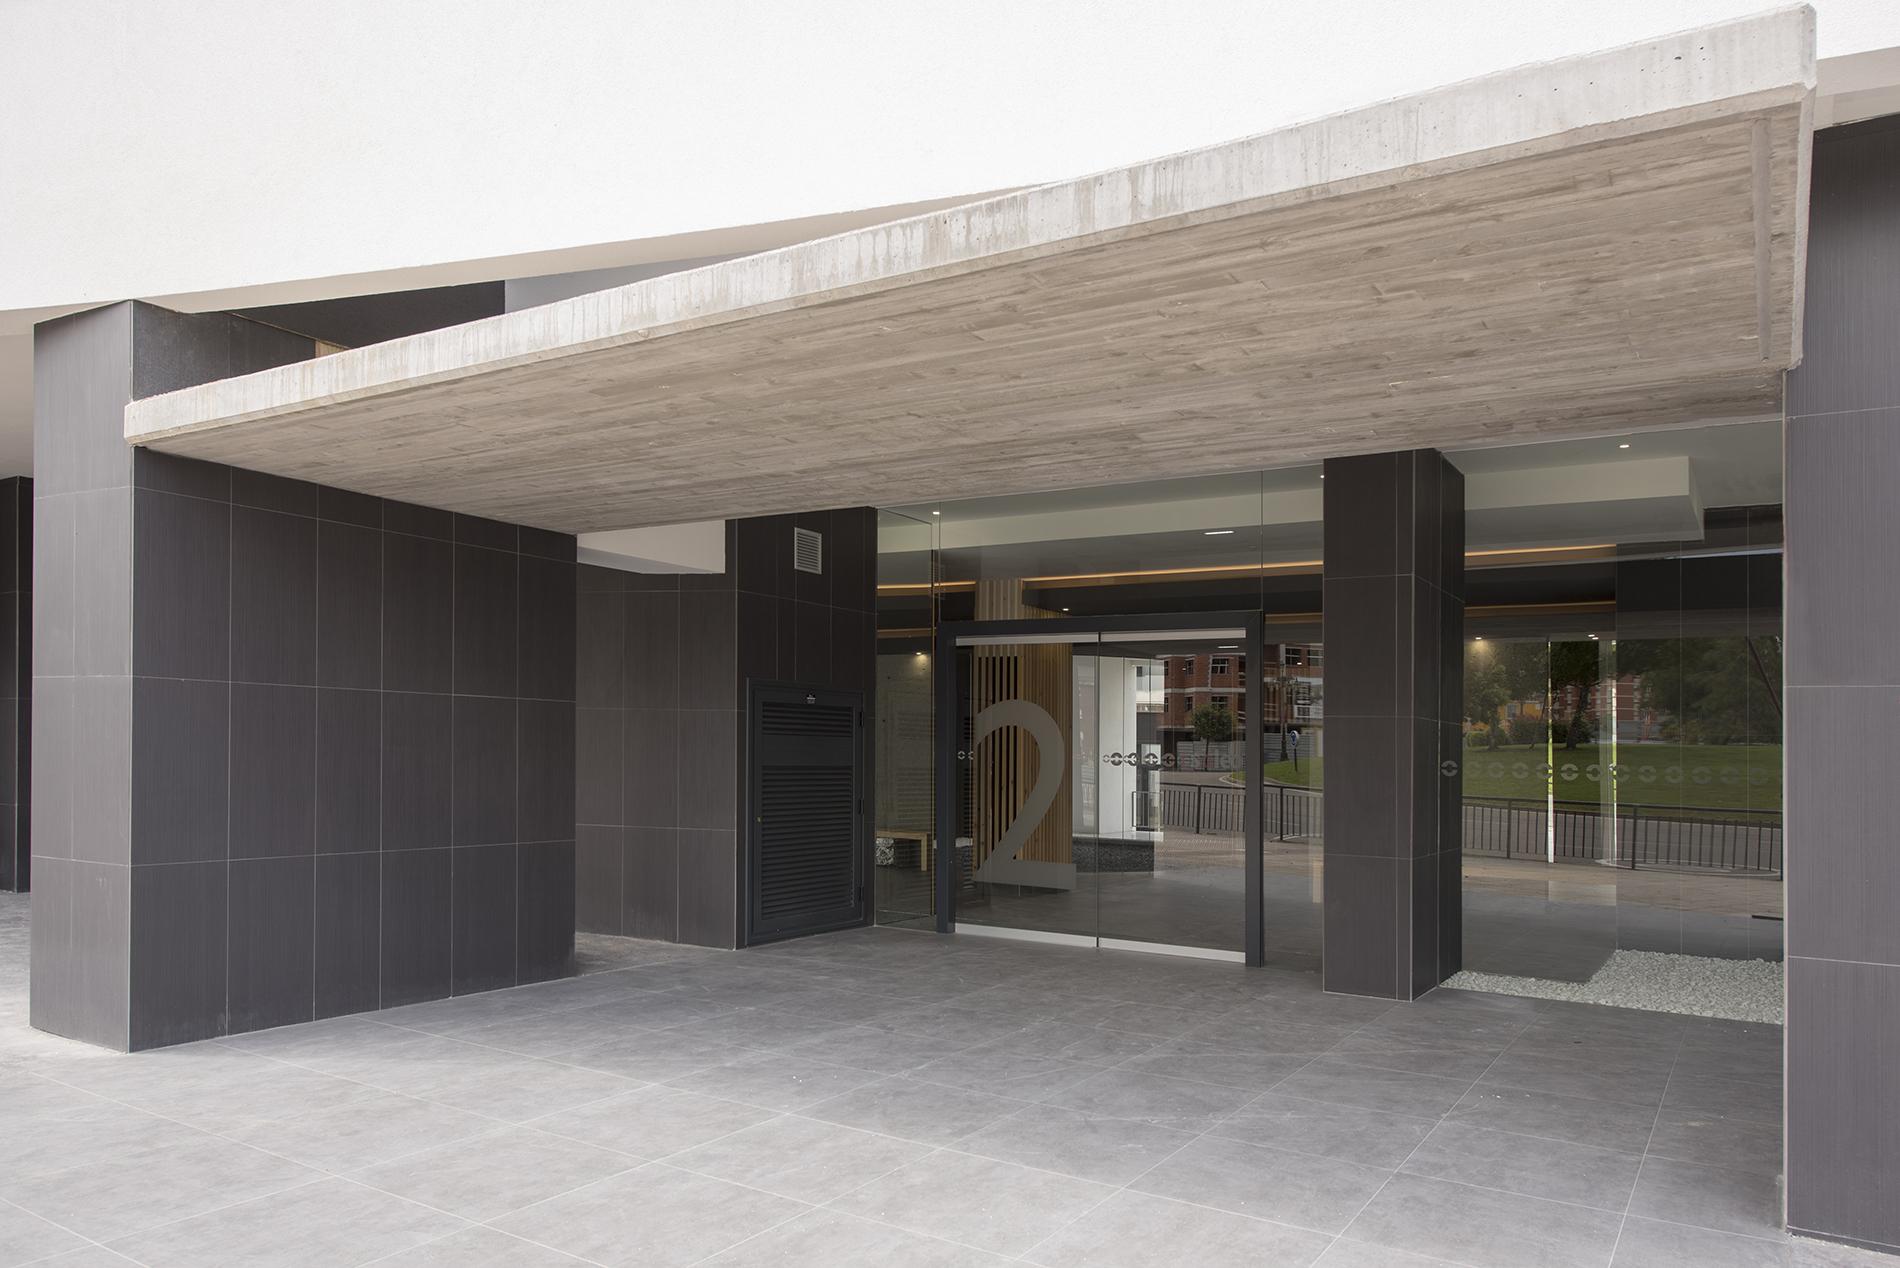 Edificio Soleo exterior